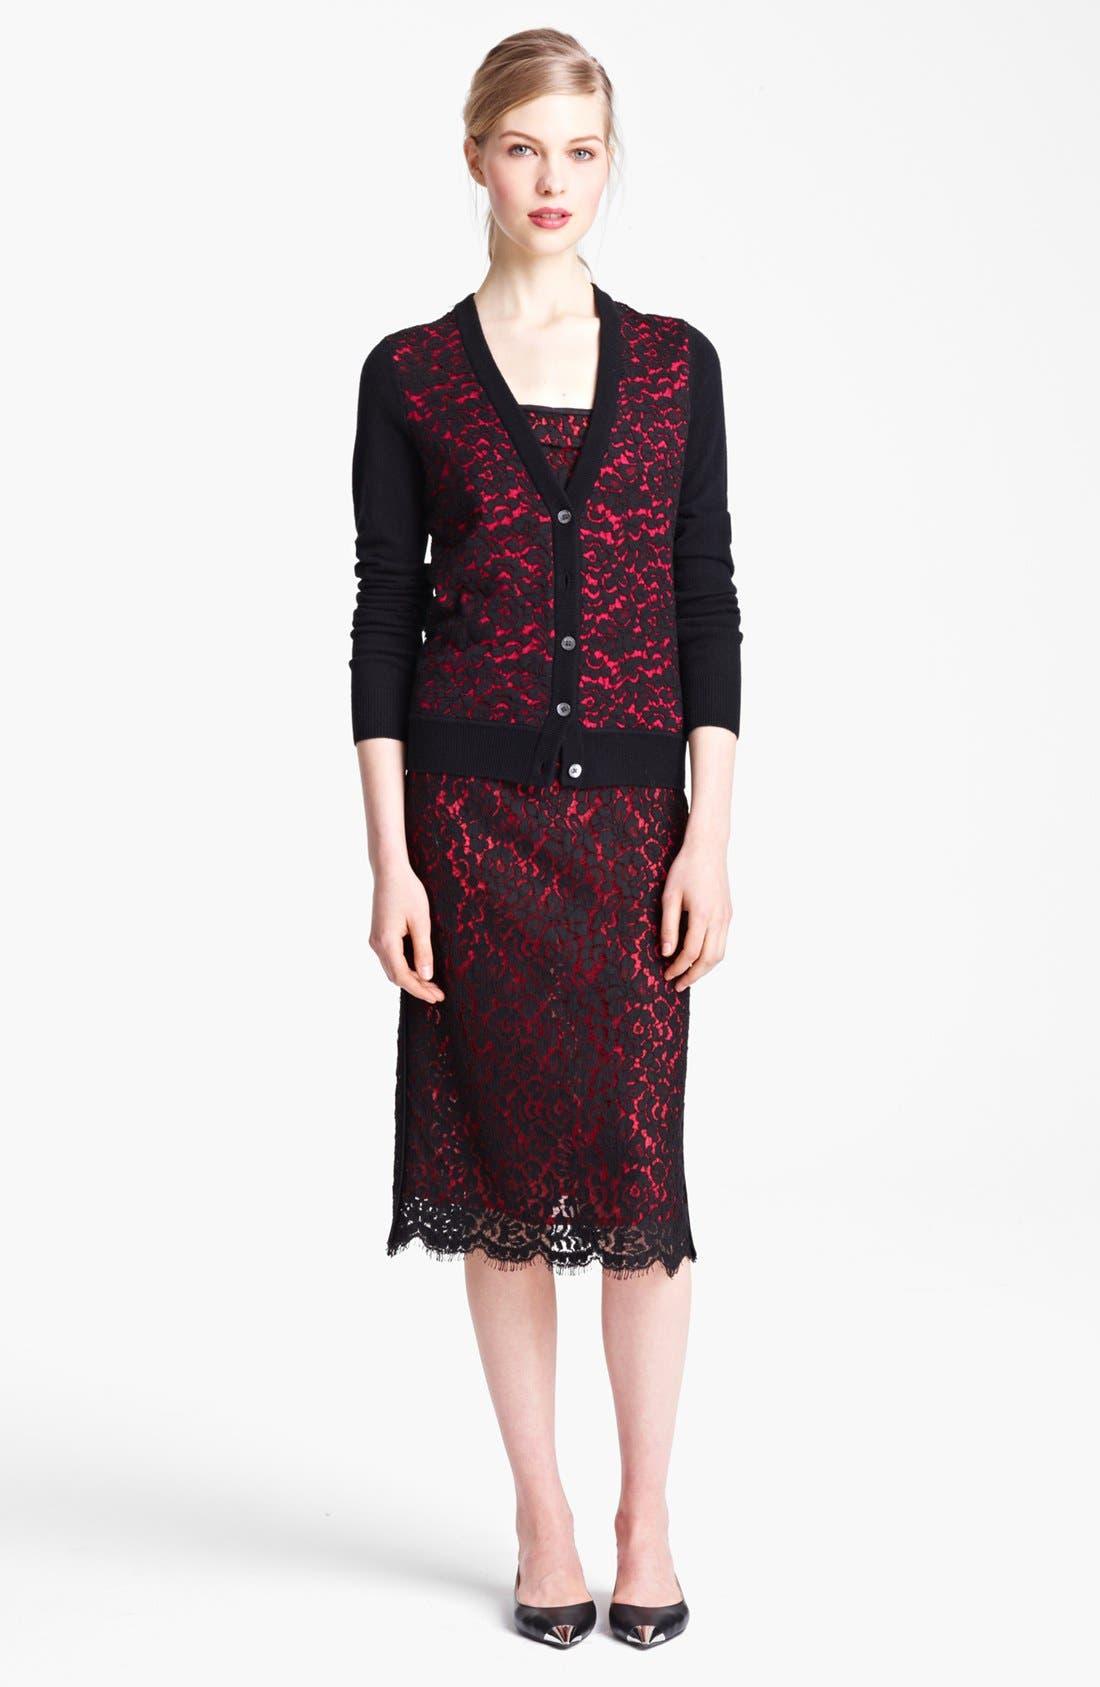 Main Image - Michael Kors Cardigan & Dress